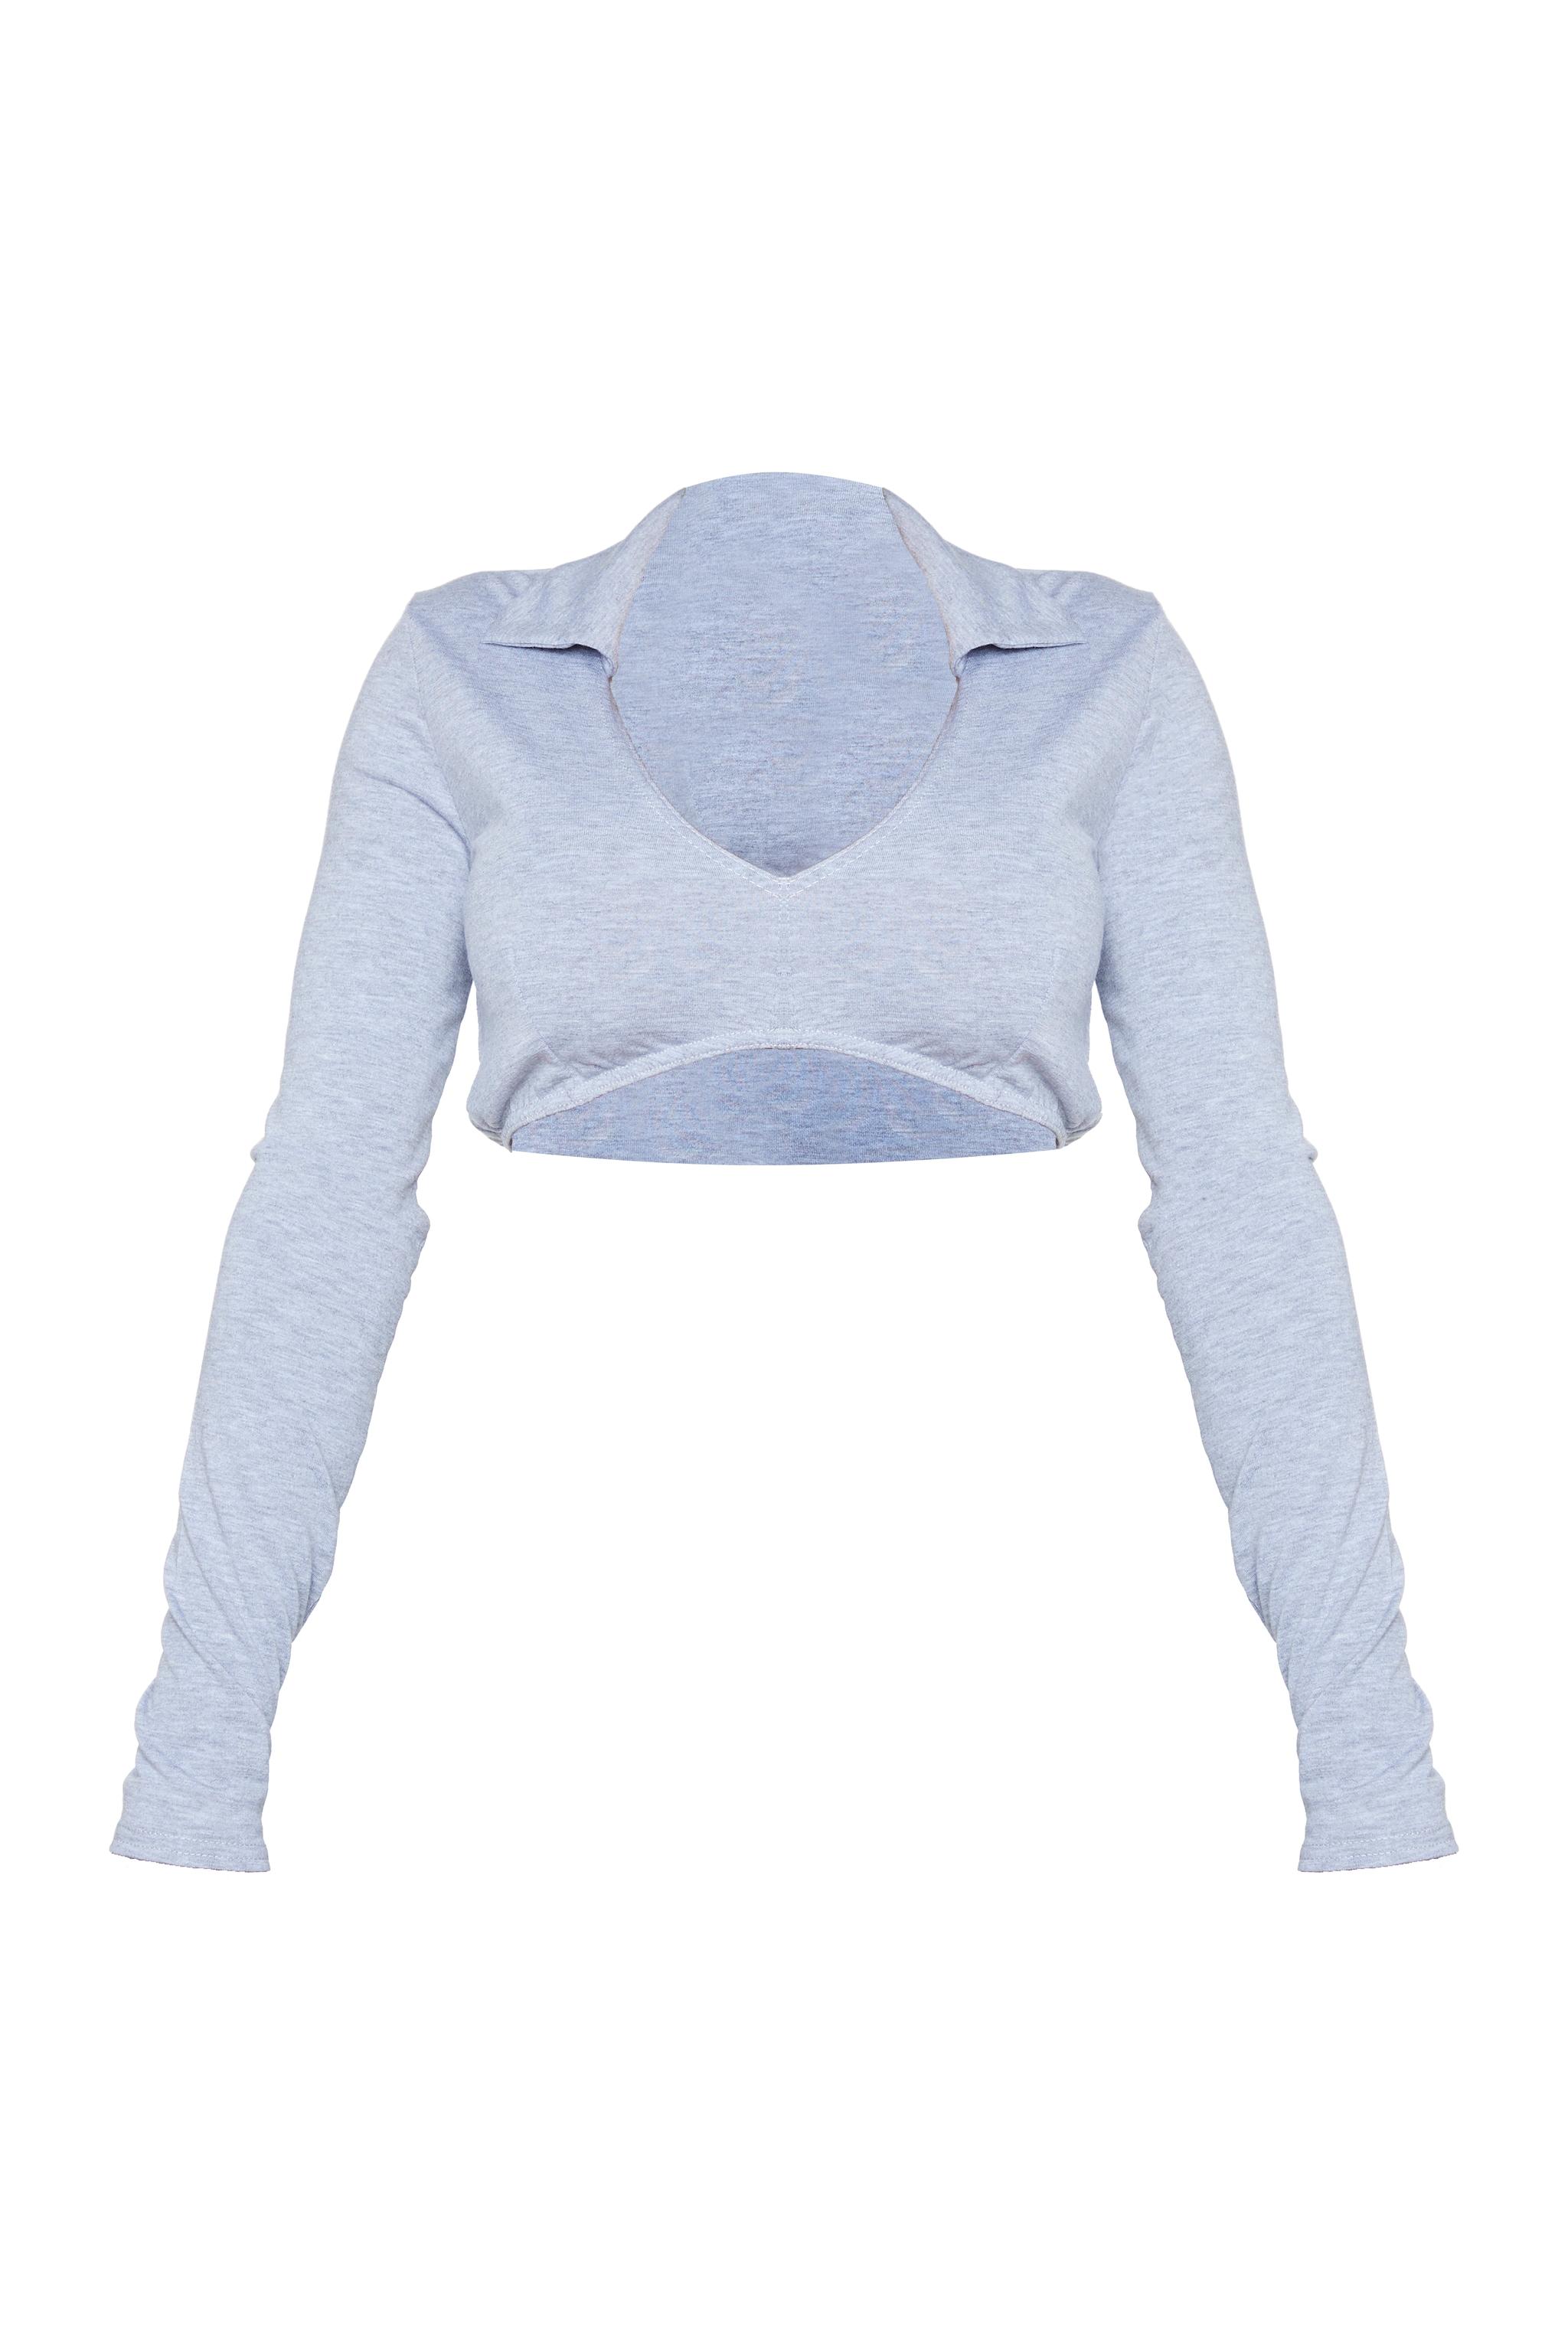 Shape Grey Jersey Collar Detail Plunge Crop Top 5